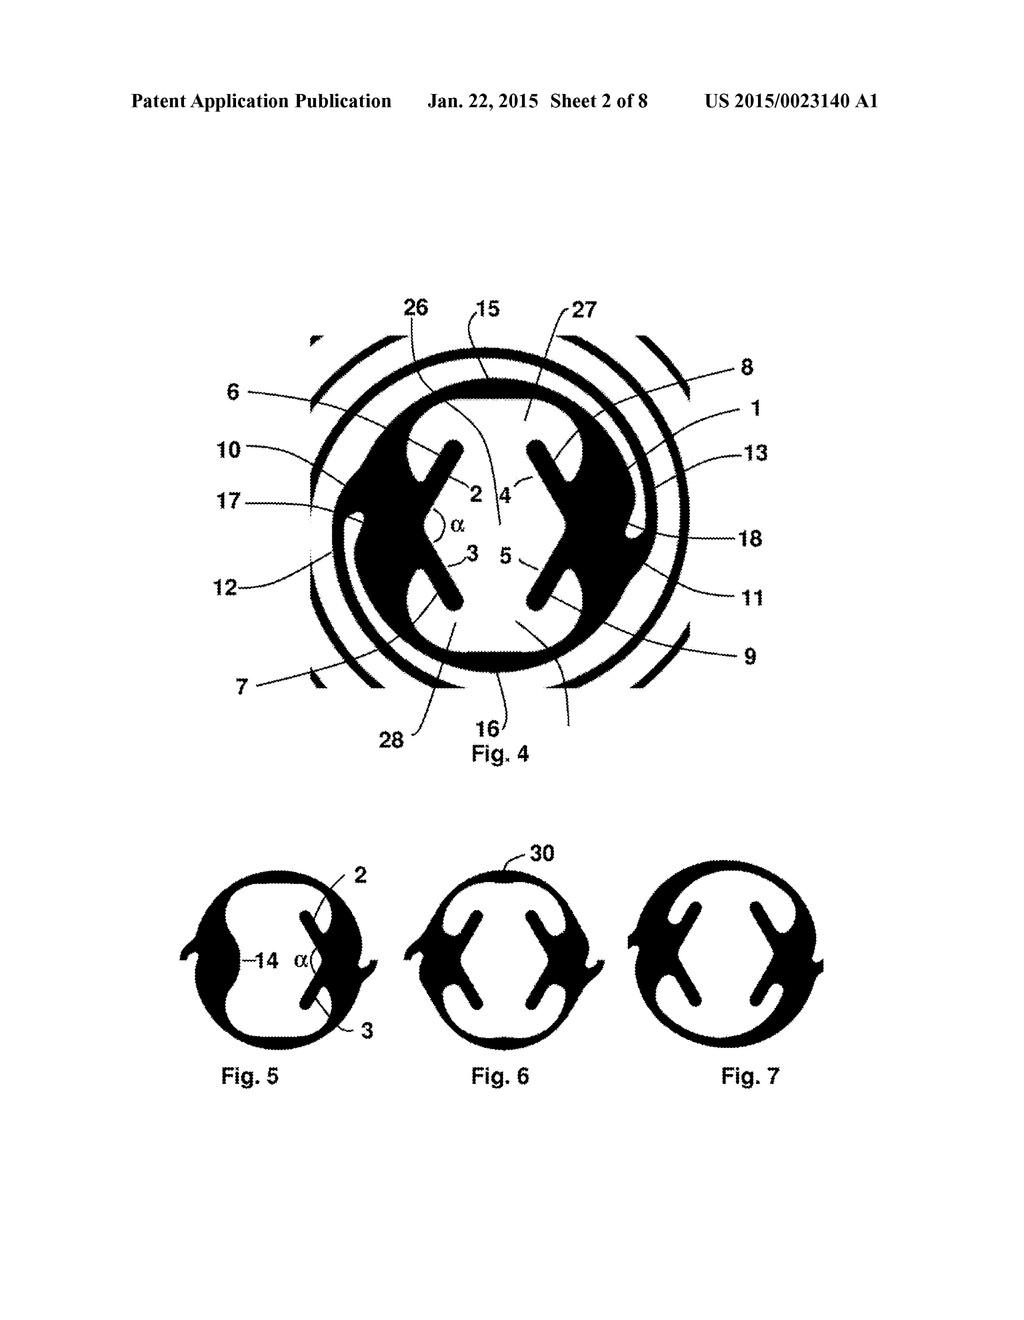 rolex-patent-9.jpg